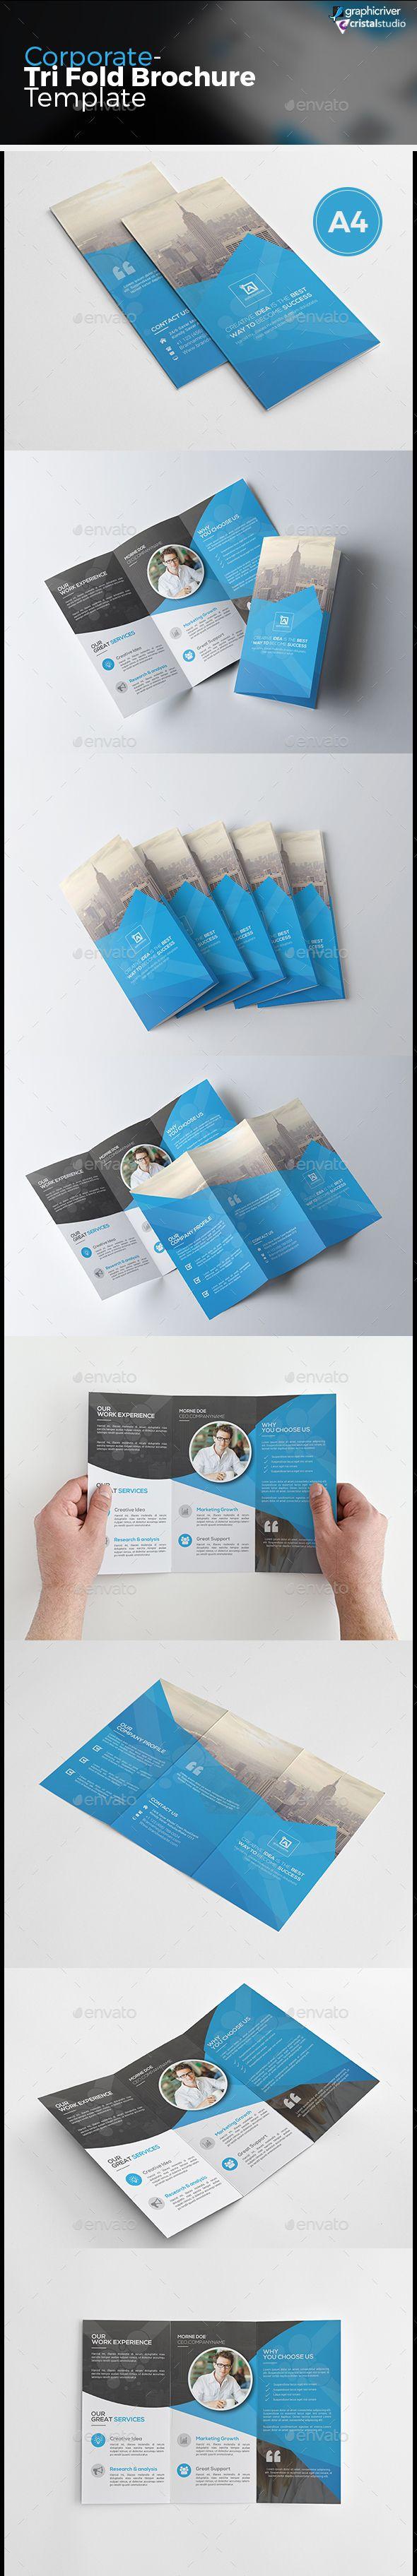 89 best Layout images on Pinterest | Flyer design, Business flyers ...